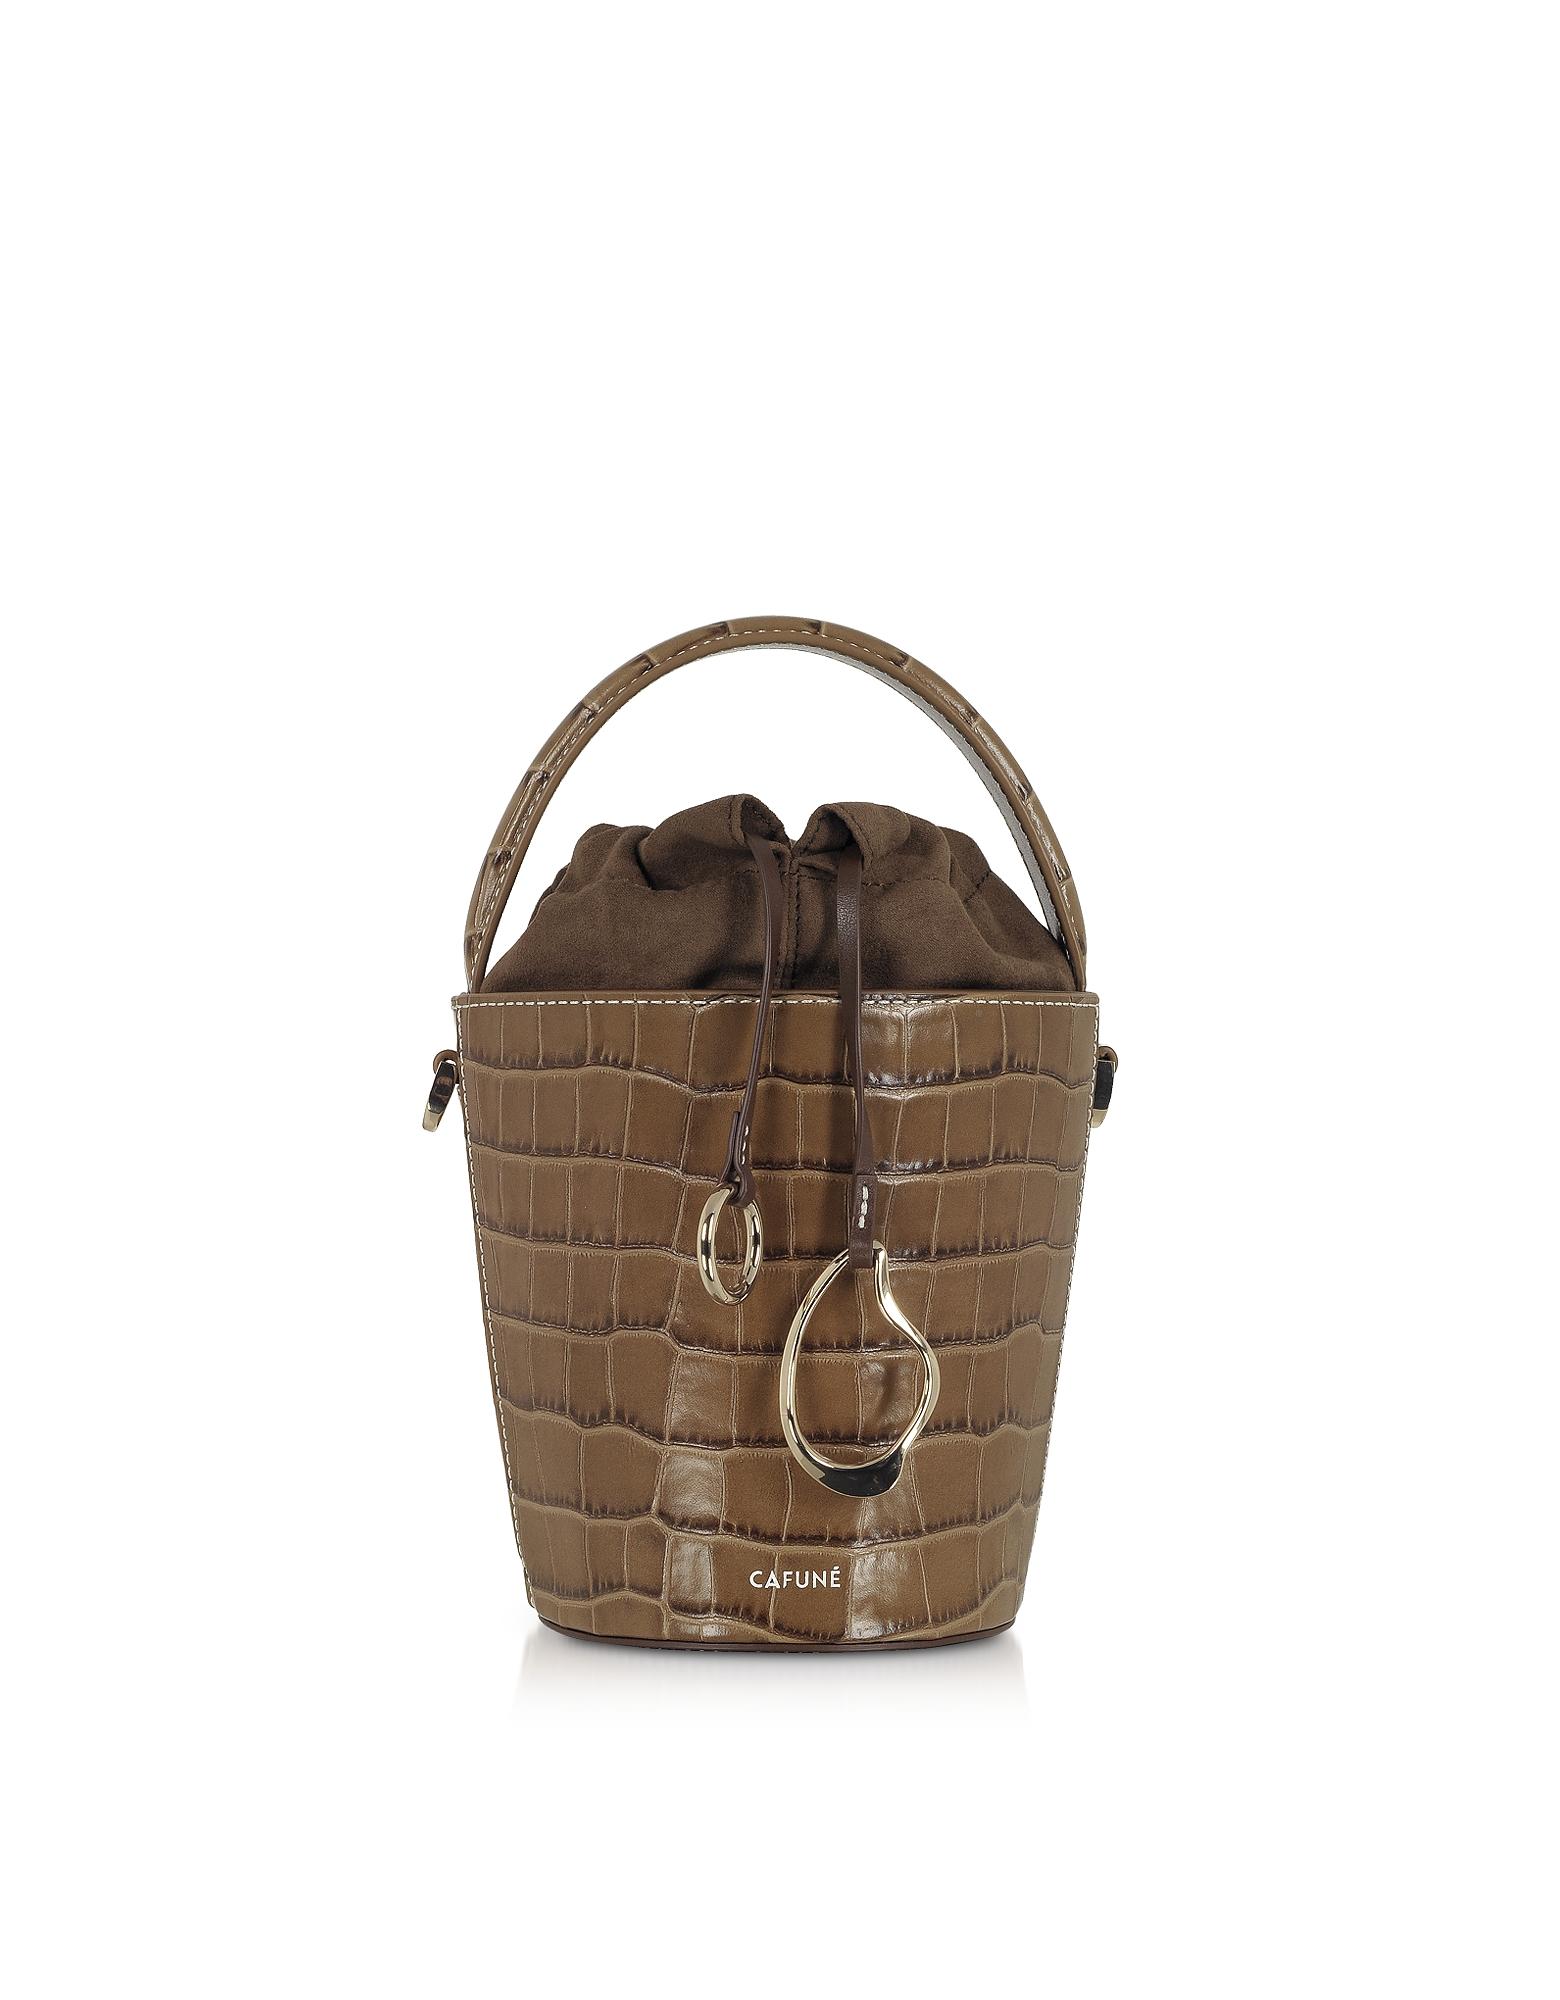 Cafuné Designer Handbags, Walnut Croco Embossed Leather Mini Bucket Bag